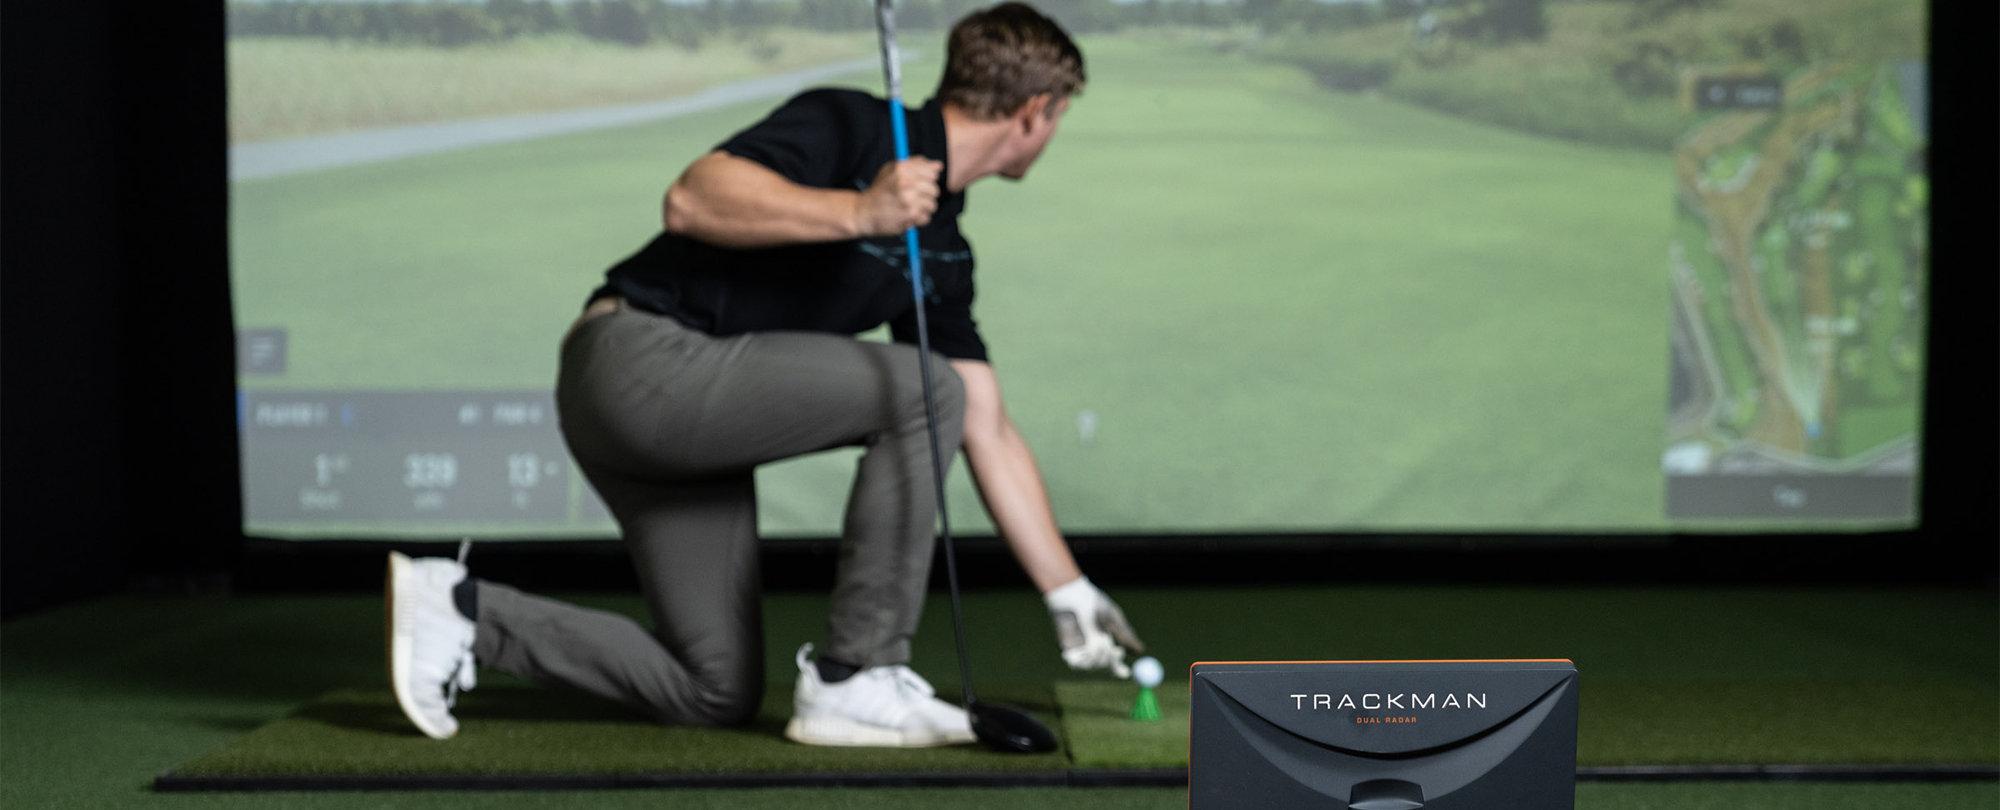 man using a golf simulator